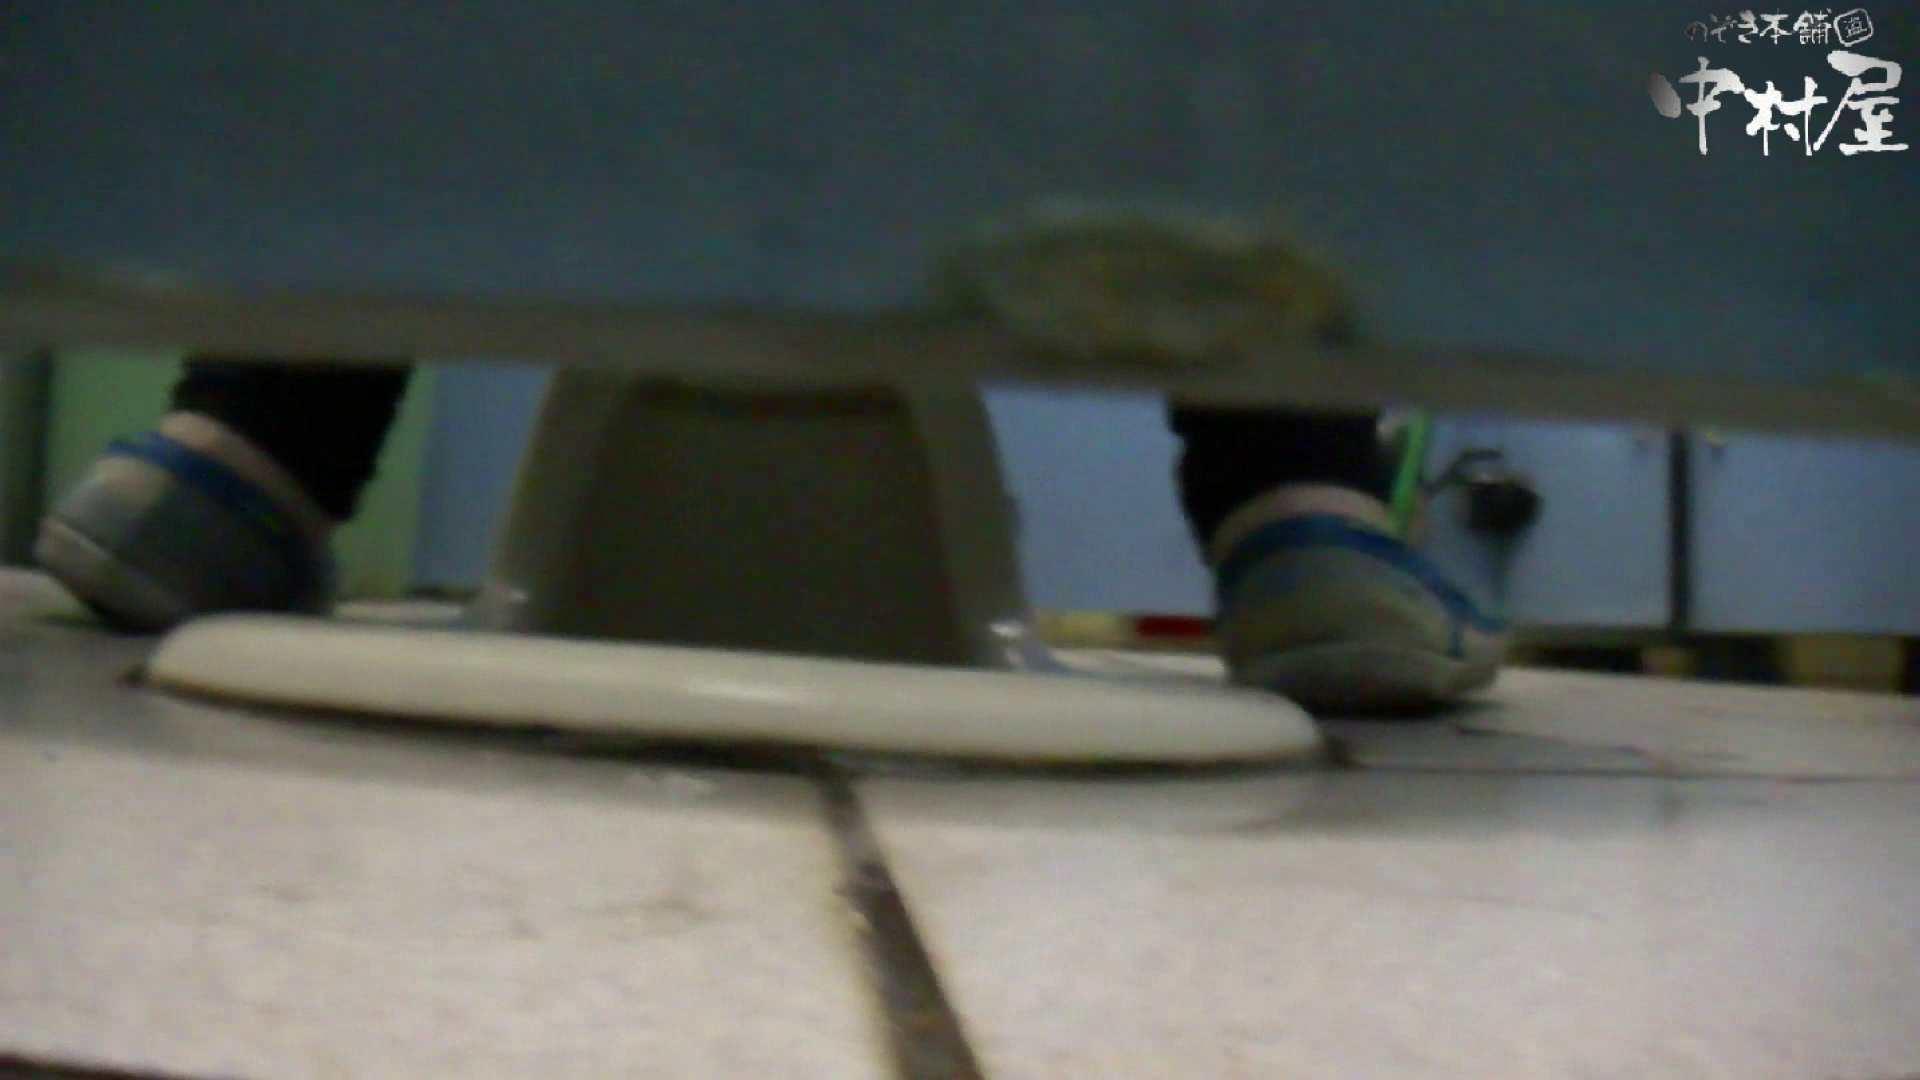 GOD HAND 芸術大学盗撮‼vol.79 OLエロ画像 盗撮ワレメ無修正動画無料 38PICs 38